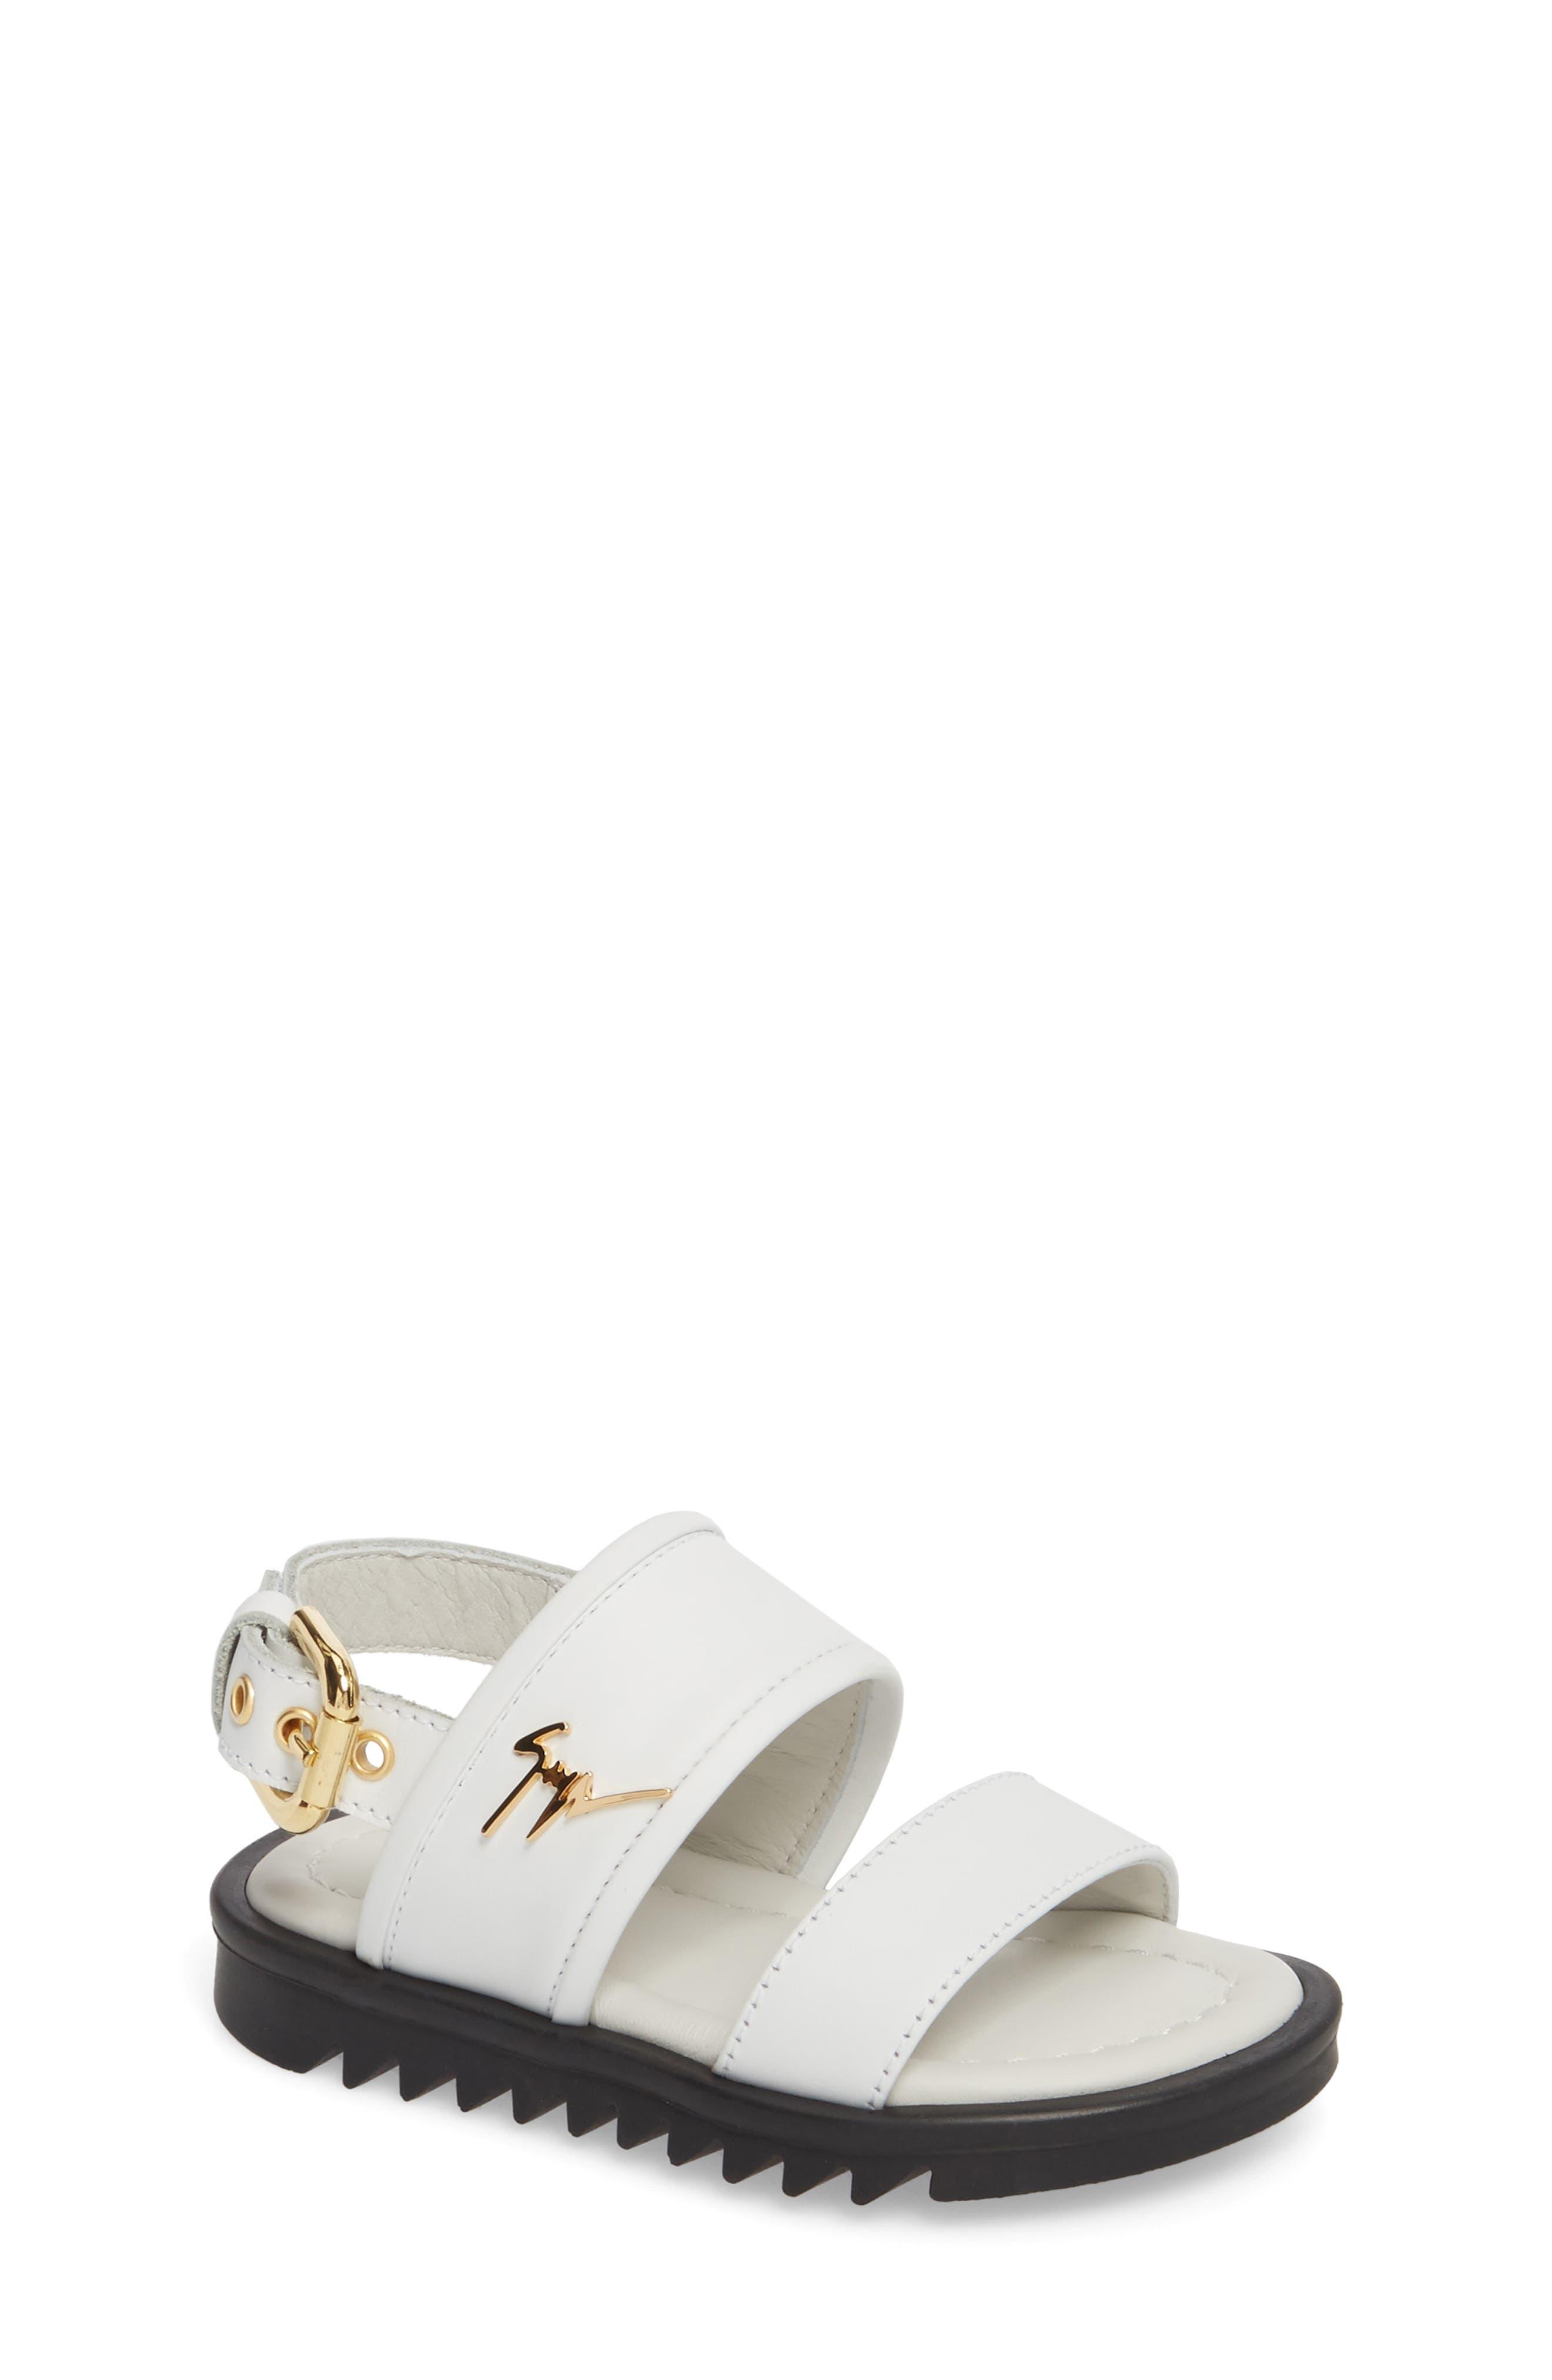 Birel Sandal,                         Main,                         color, 100